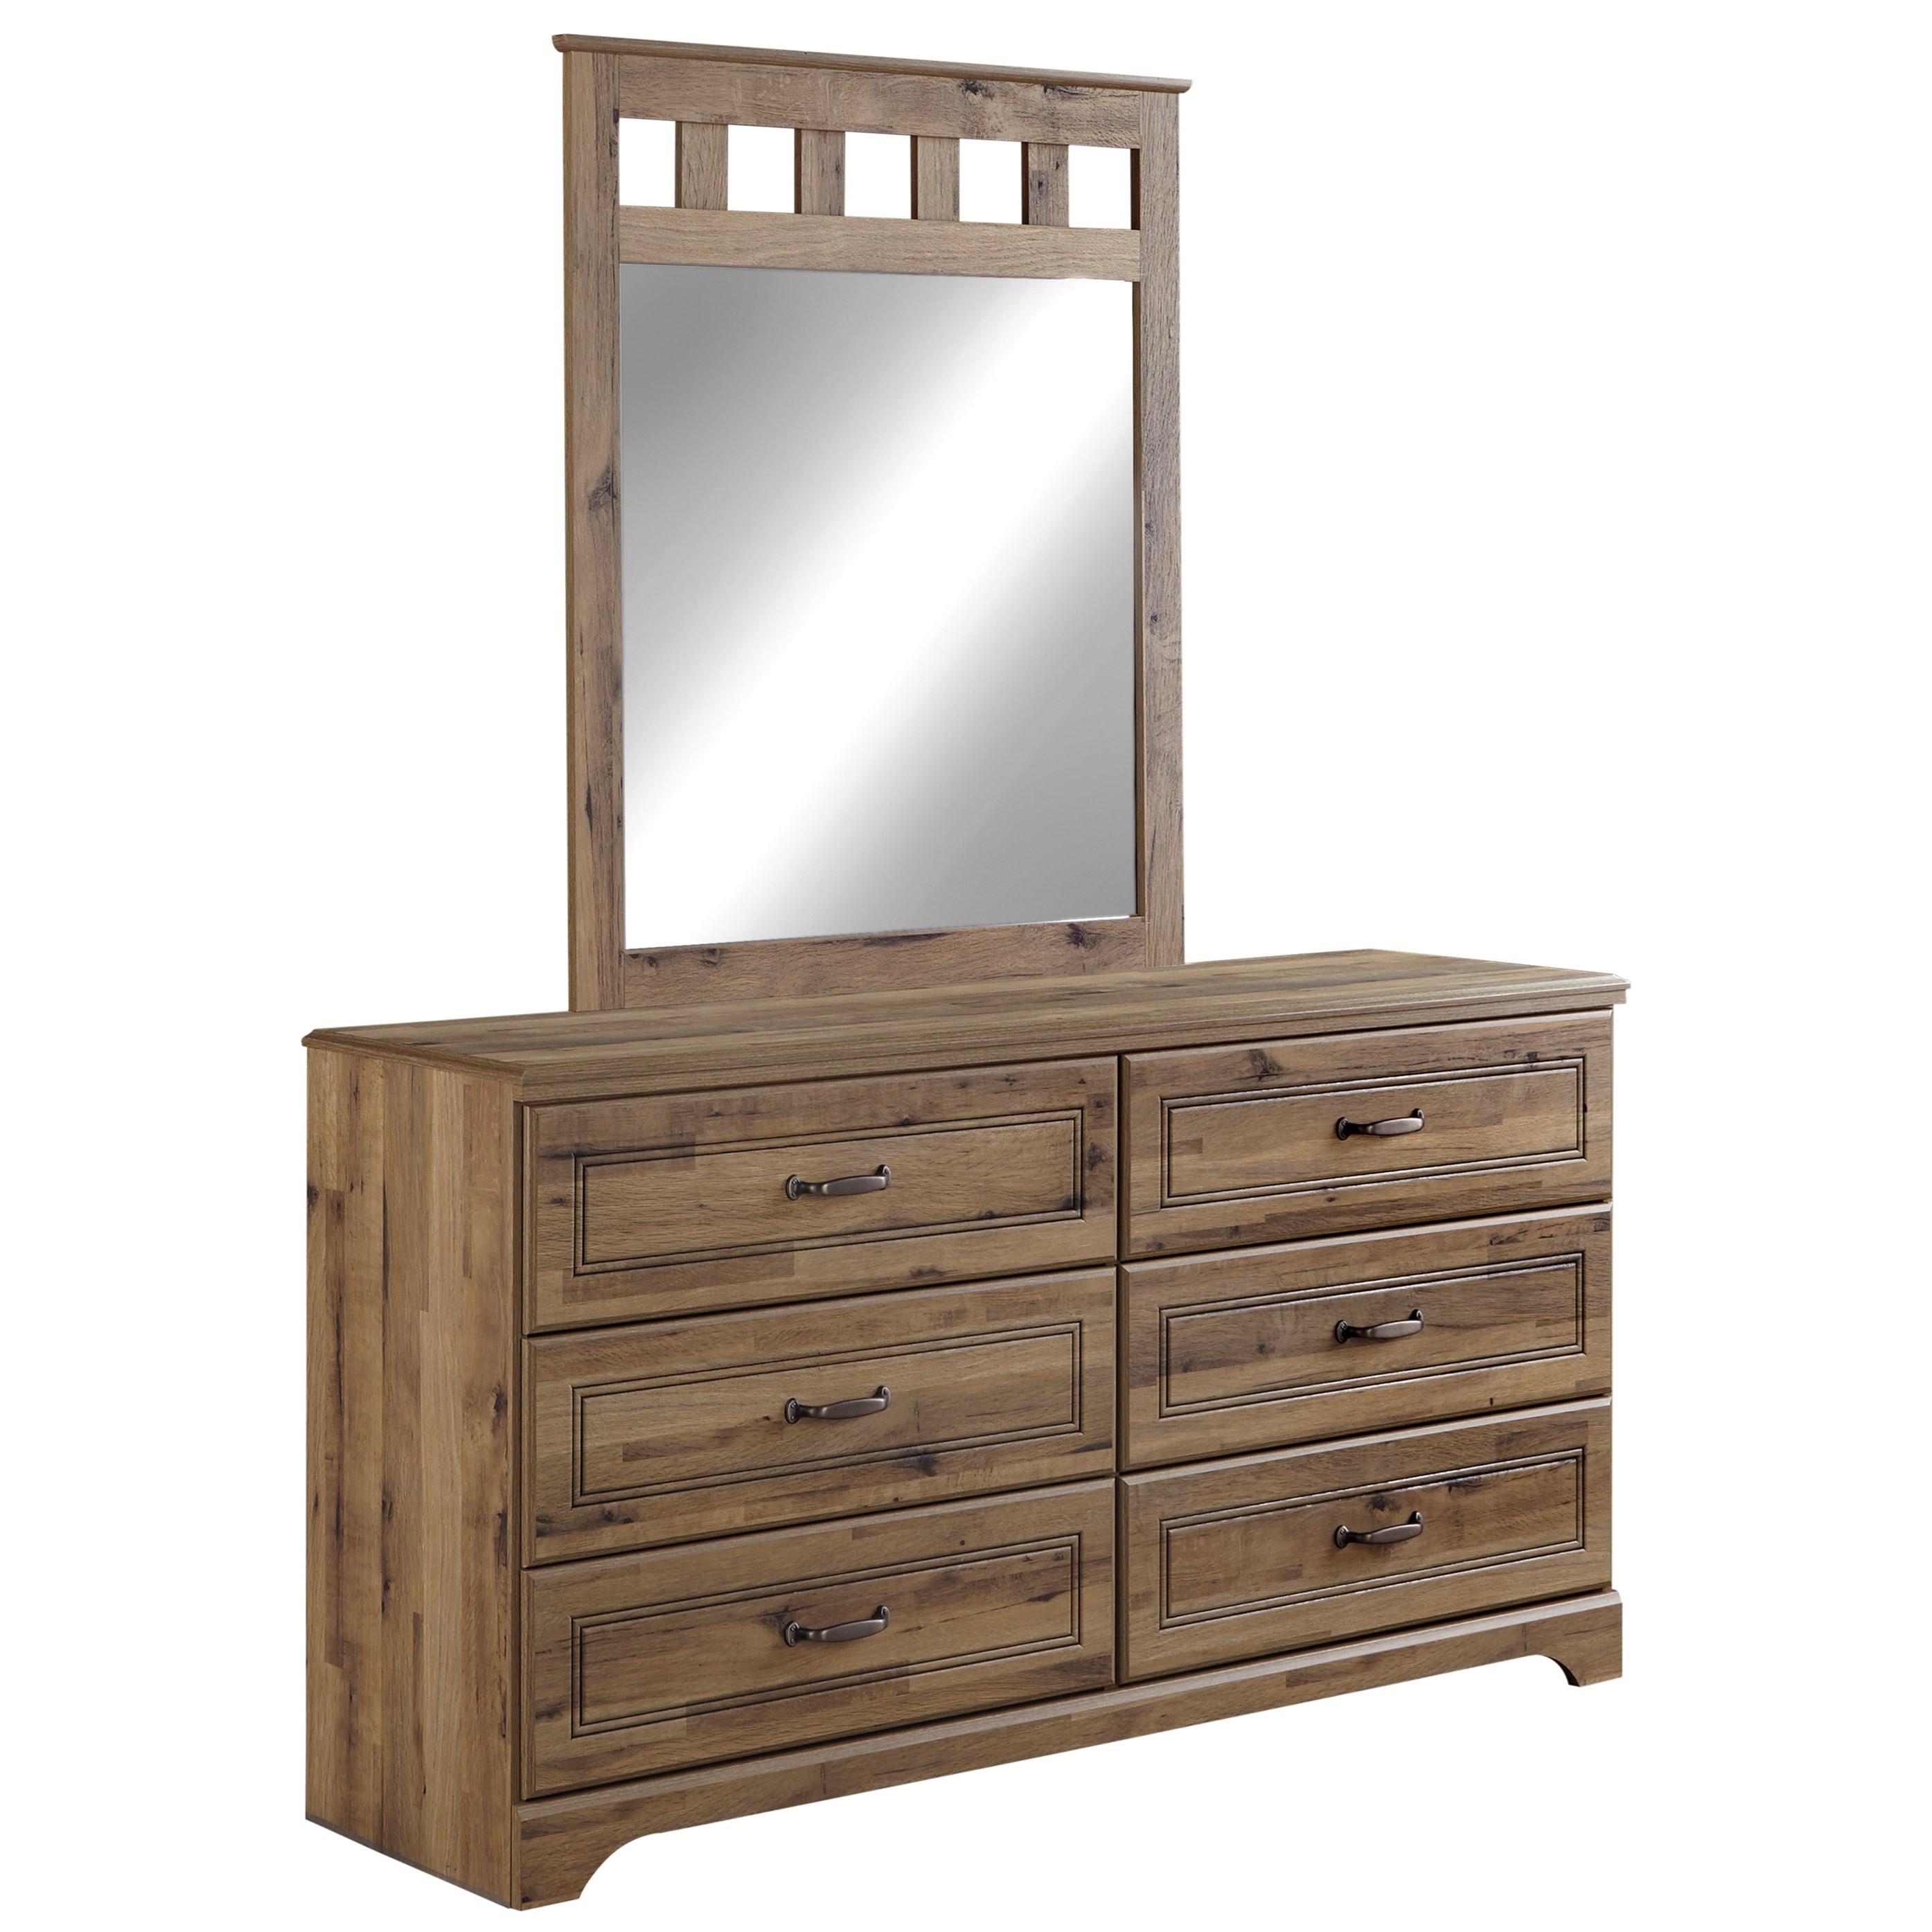 Signature Design by Ashley Brobern Dresser & Bedroom Mirror - Item Number: B173-21+26